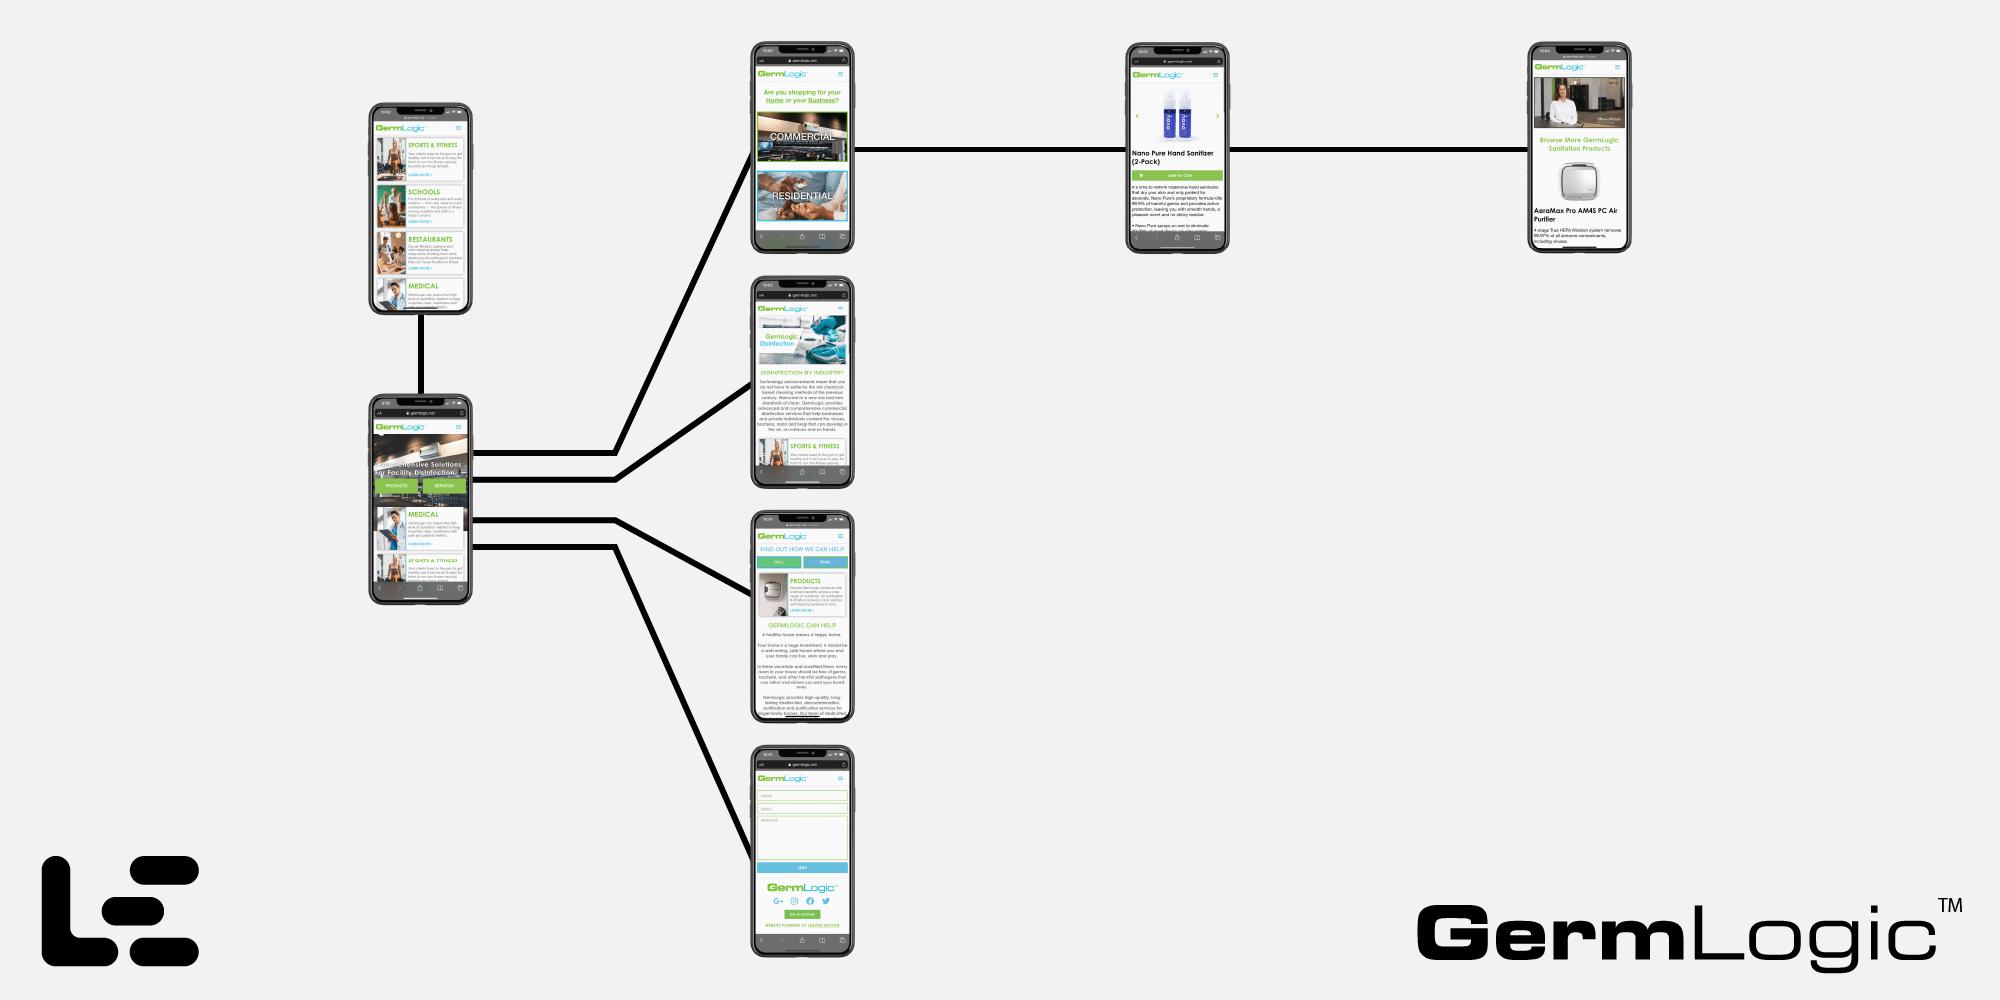 GermLogic Website Flow